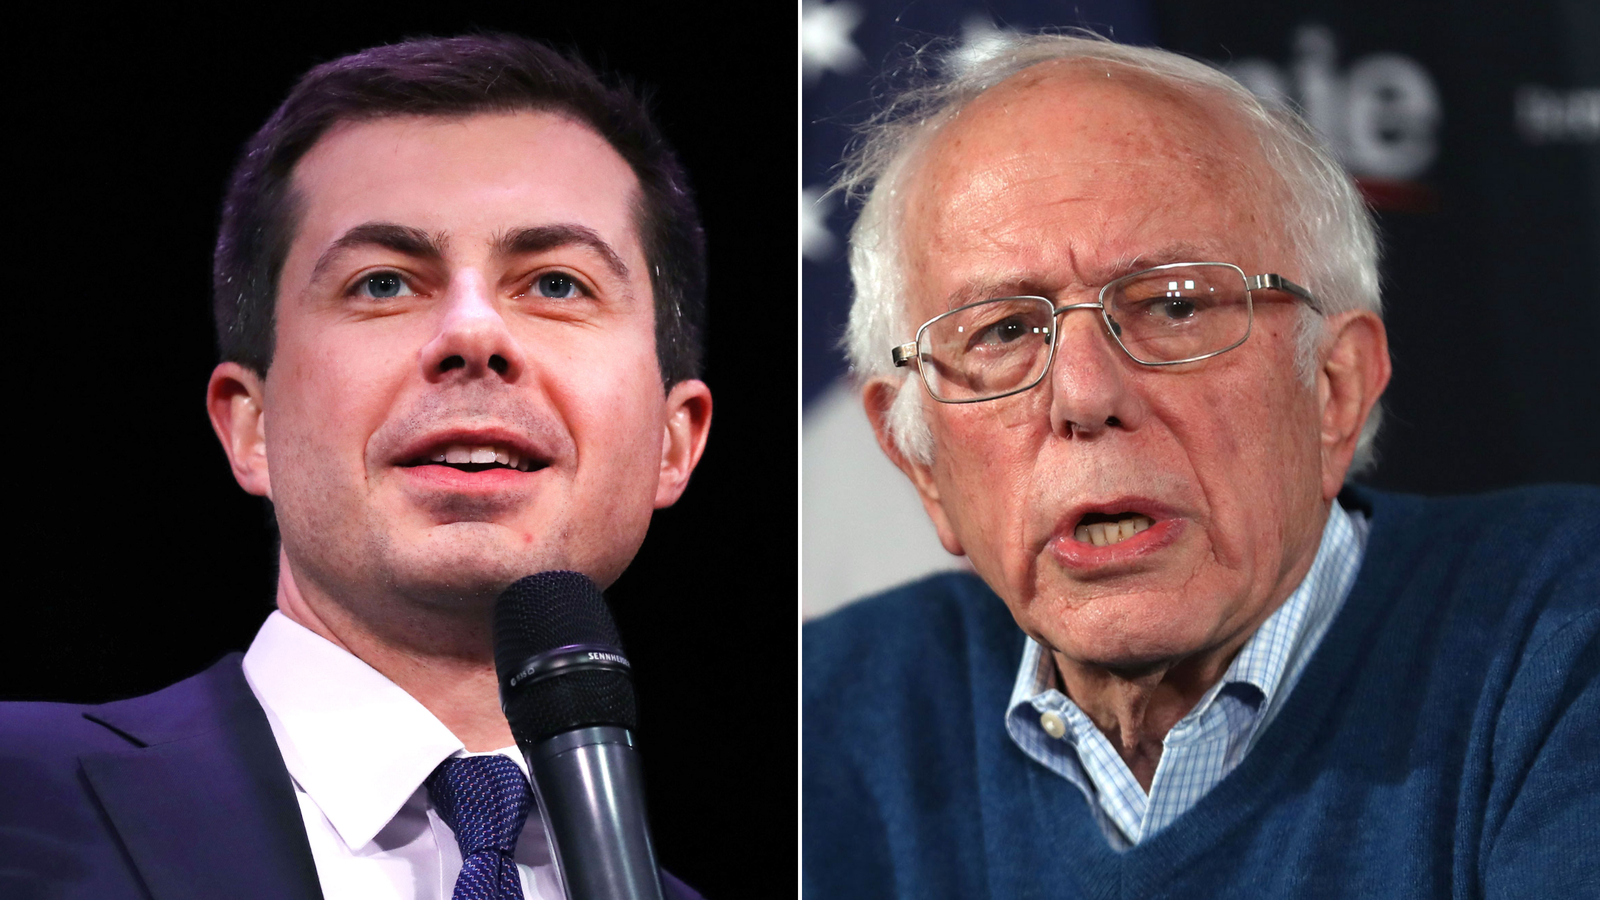 Pete Buttigieg and Bernie Sanders call for recounts in certain Iowa precincts